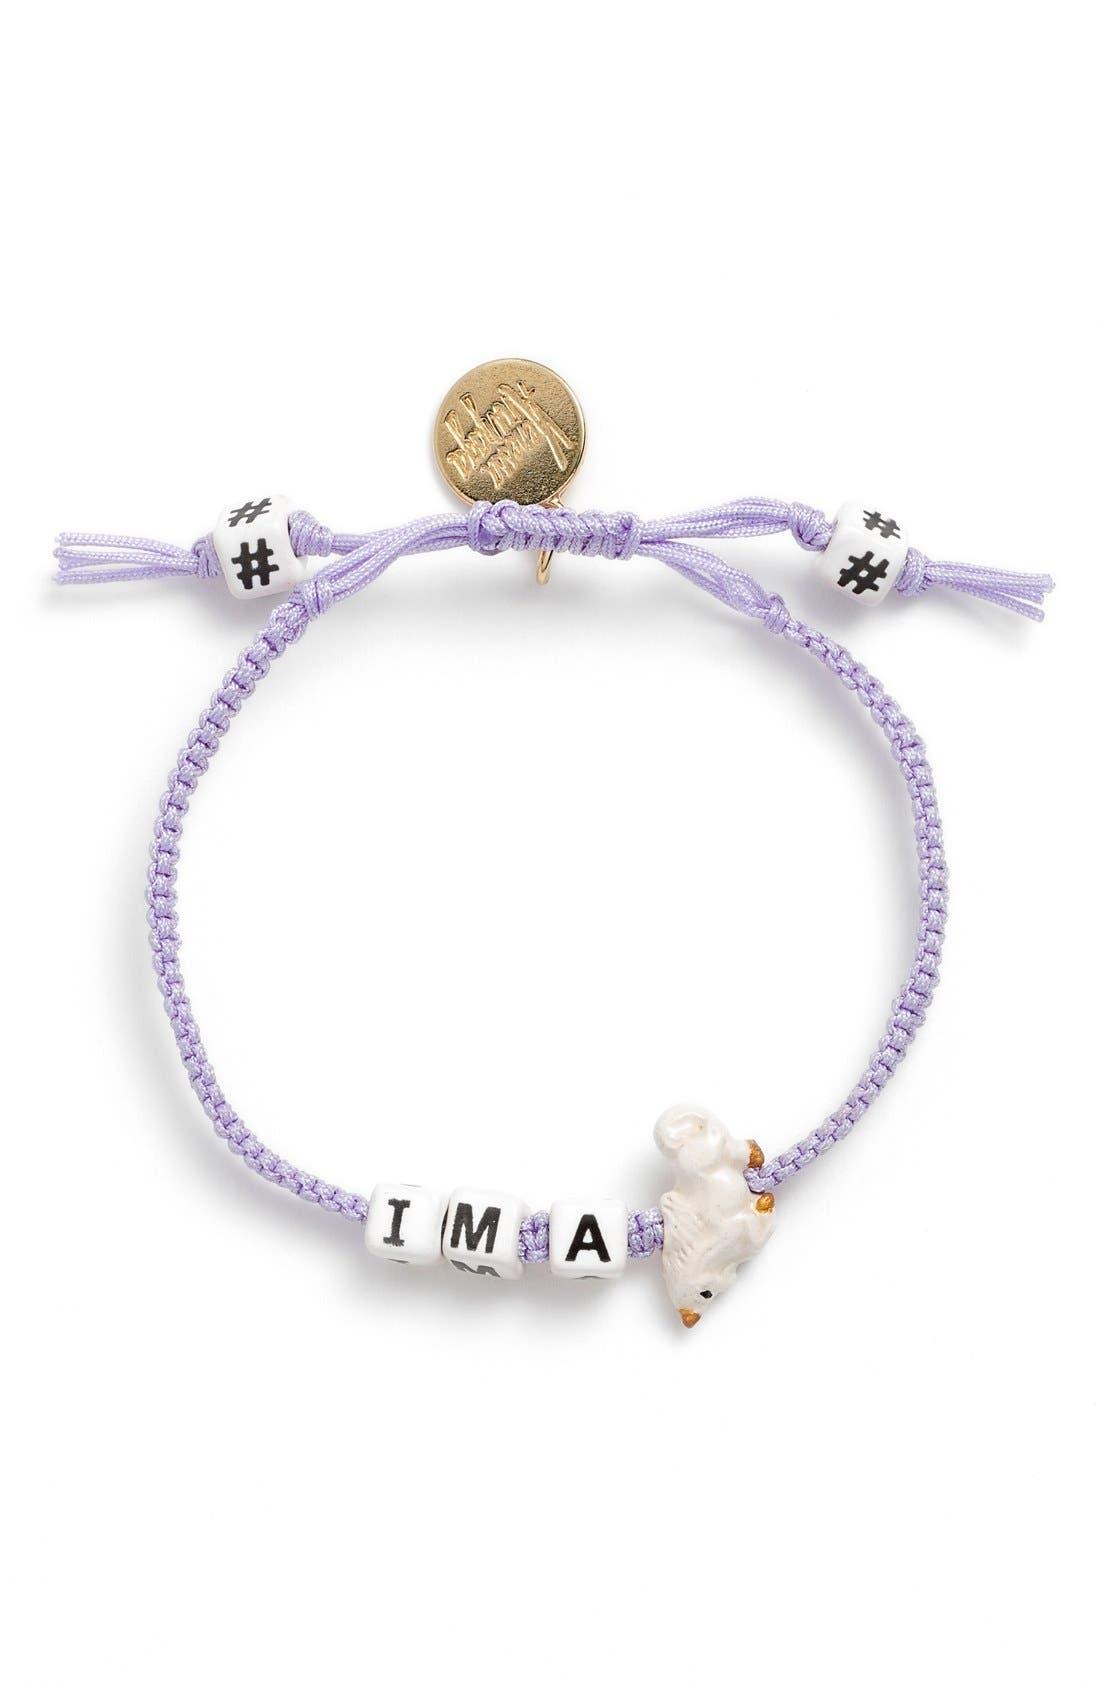 Main Image - Venessa Arizaga 'I'm a Unicorn' Bracelet